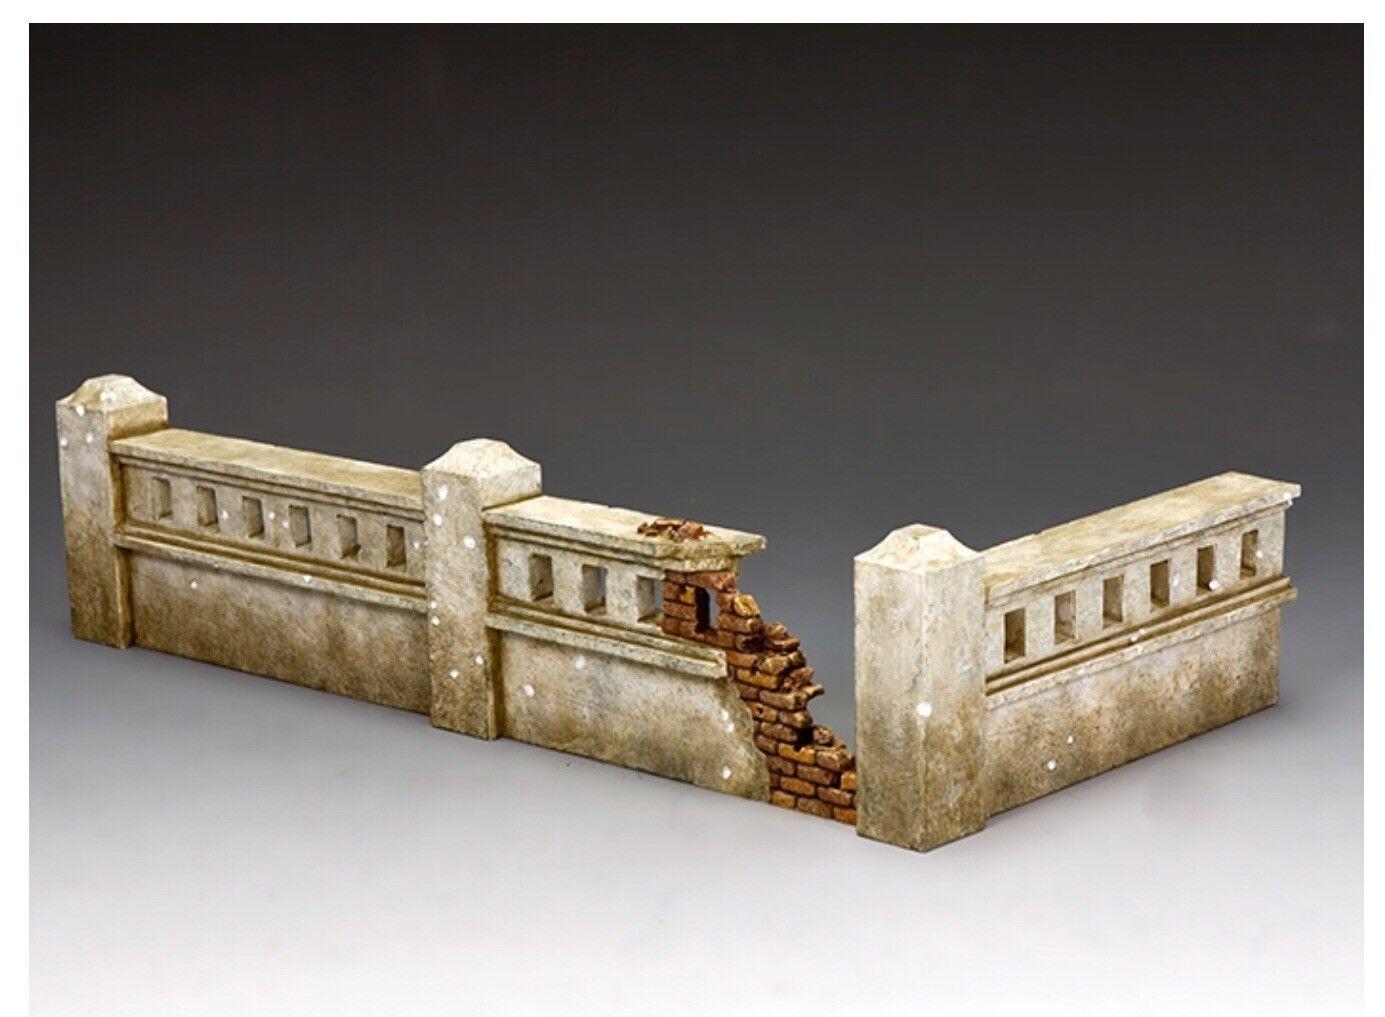 VN032 VN032 Diorama Scenery Walls Set Vietnam WW1 WW2 Napoleonic Etc Mint In Box VN 32